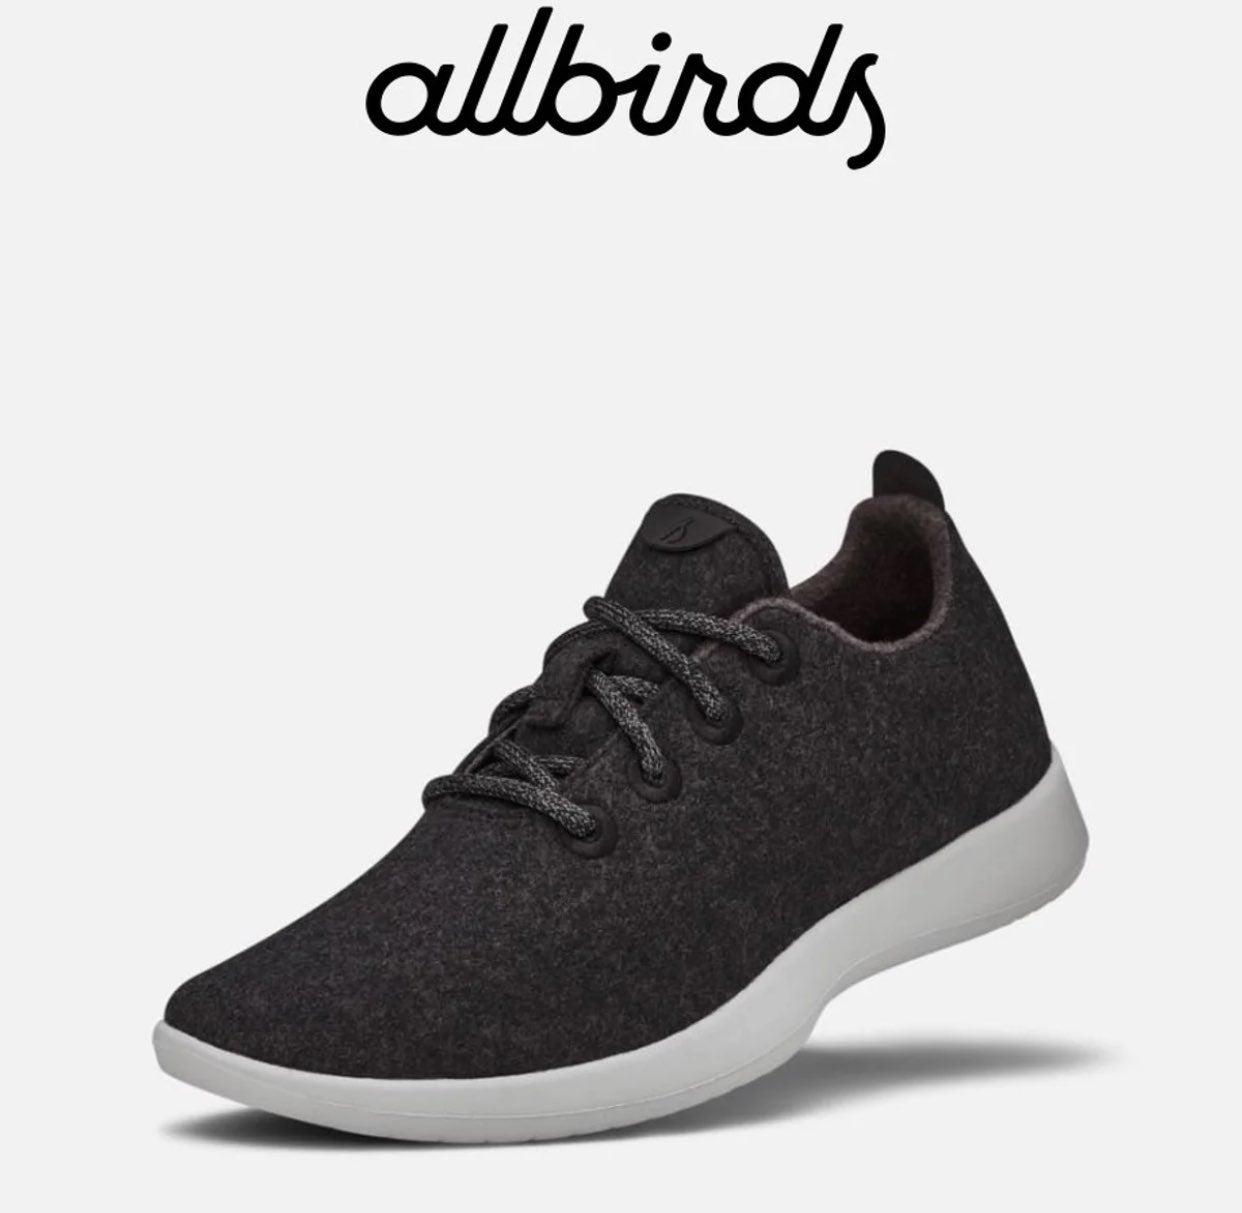 Allbirds Black And Gray Wool Runners